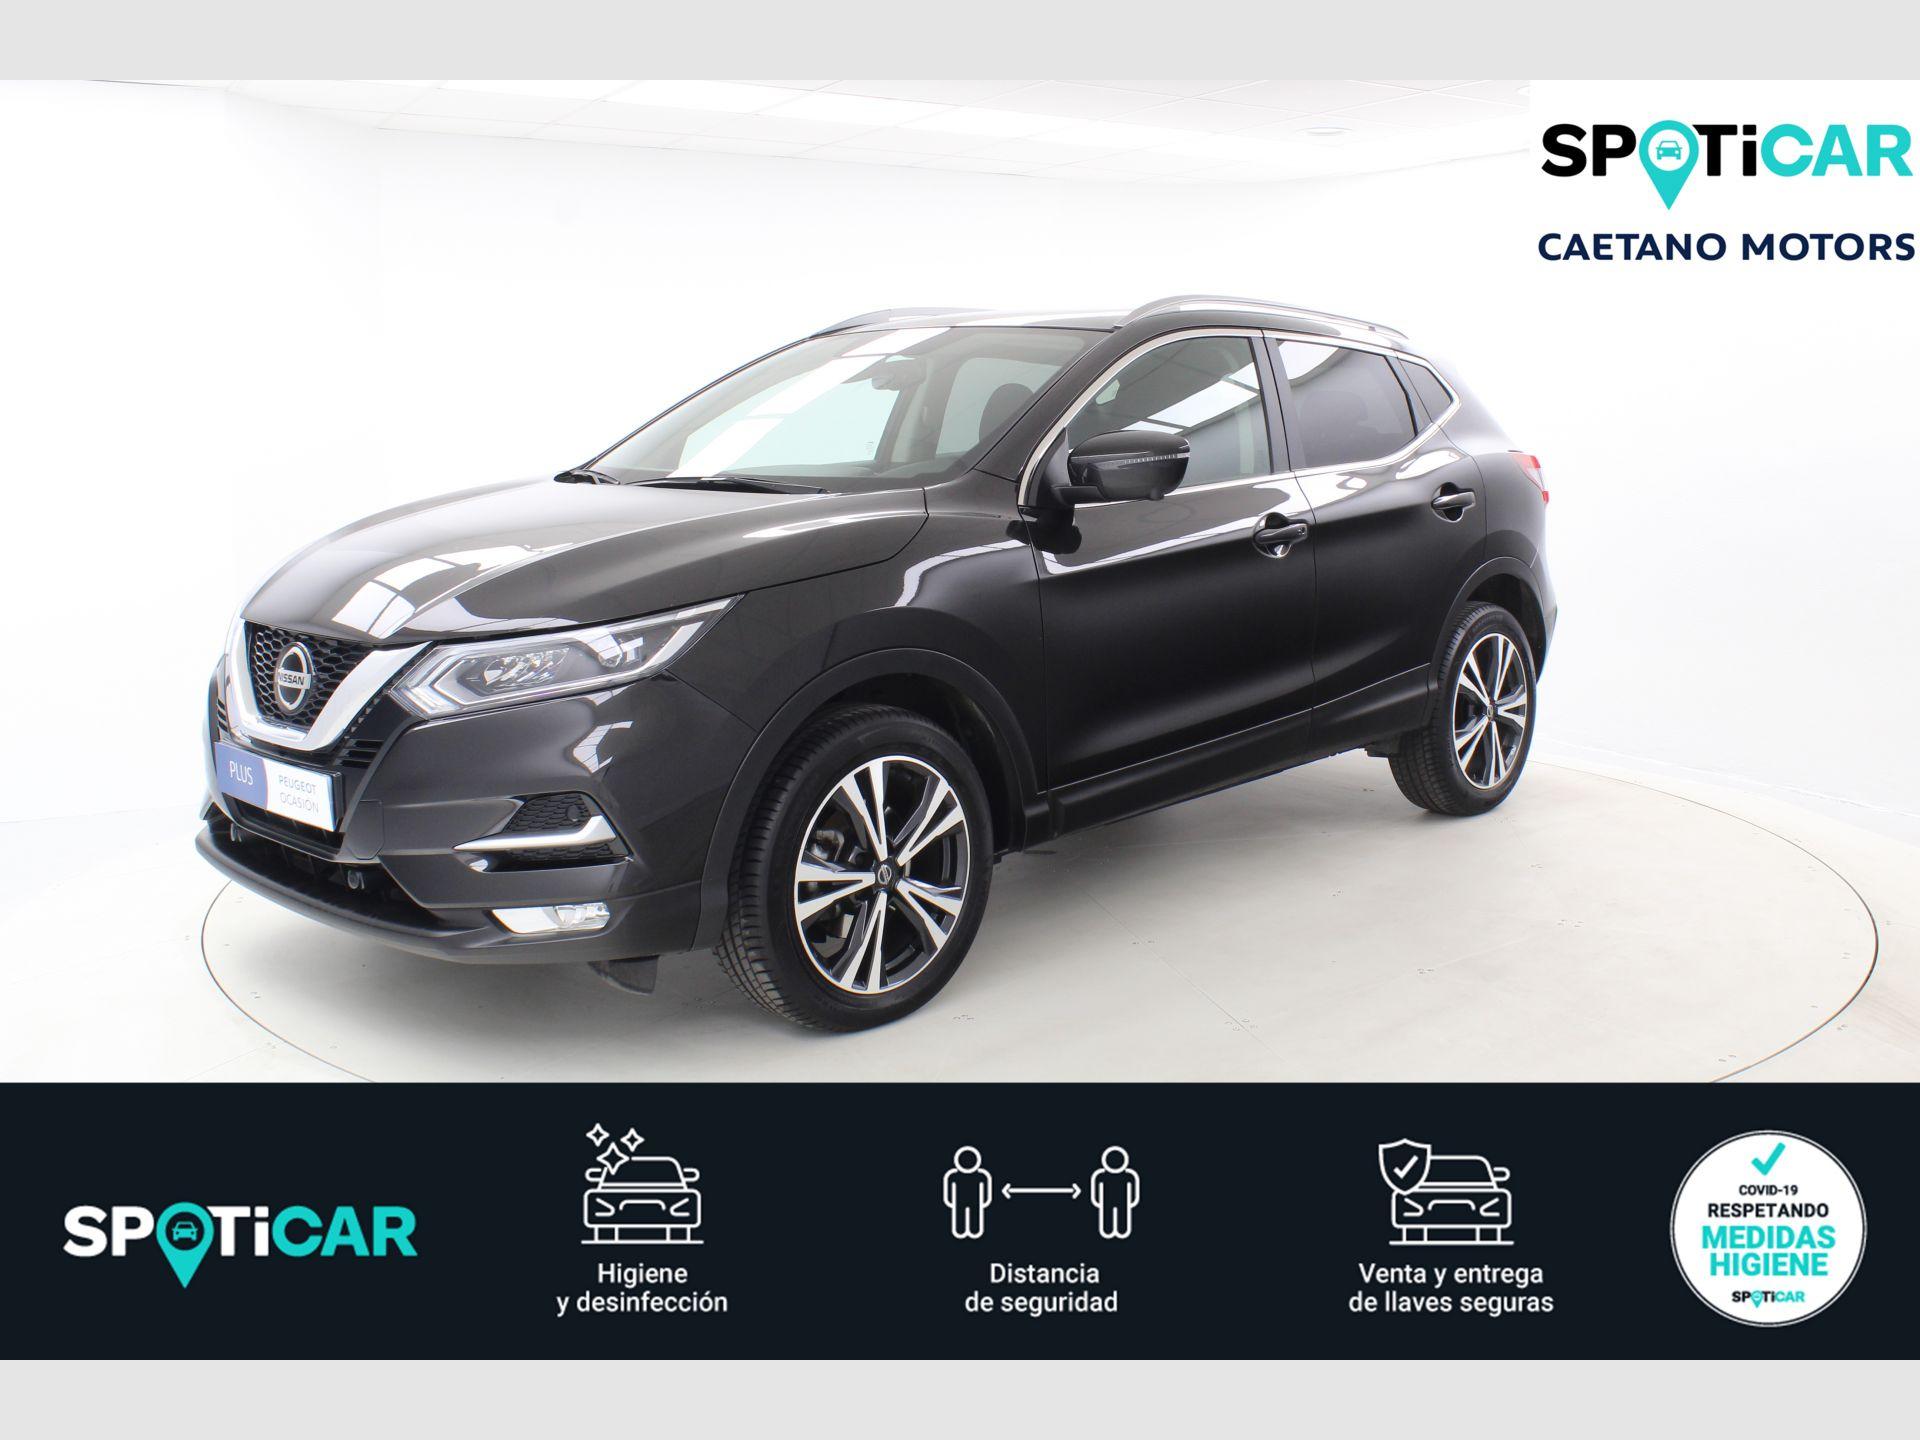 Nissan Qashqai 1.3 DIG-T N-Connecta 4x2 103kW segunda mano Málaga